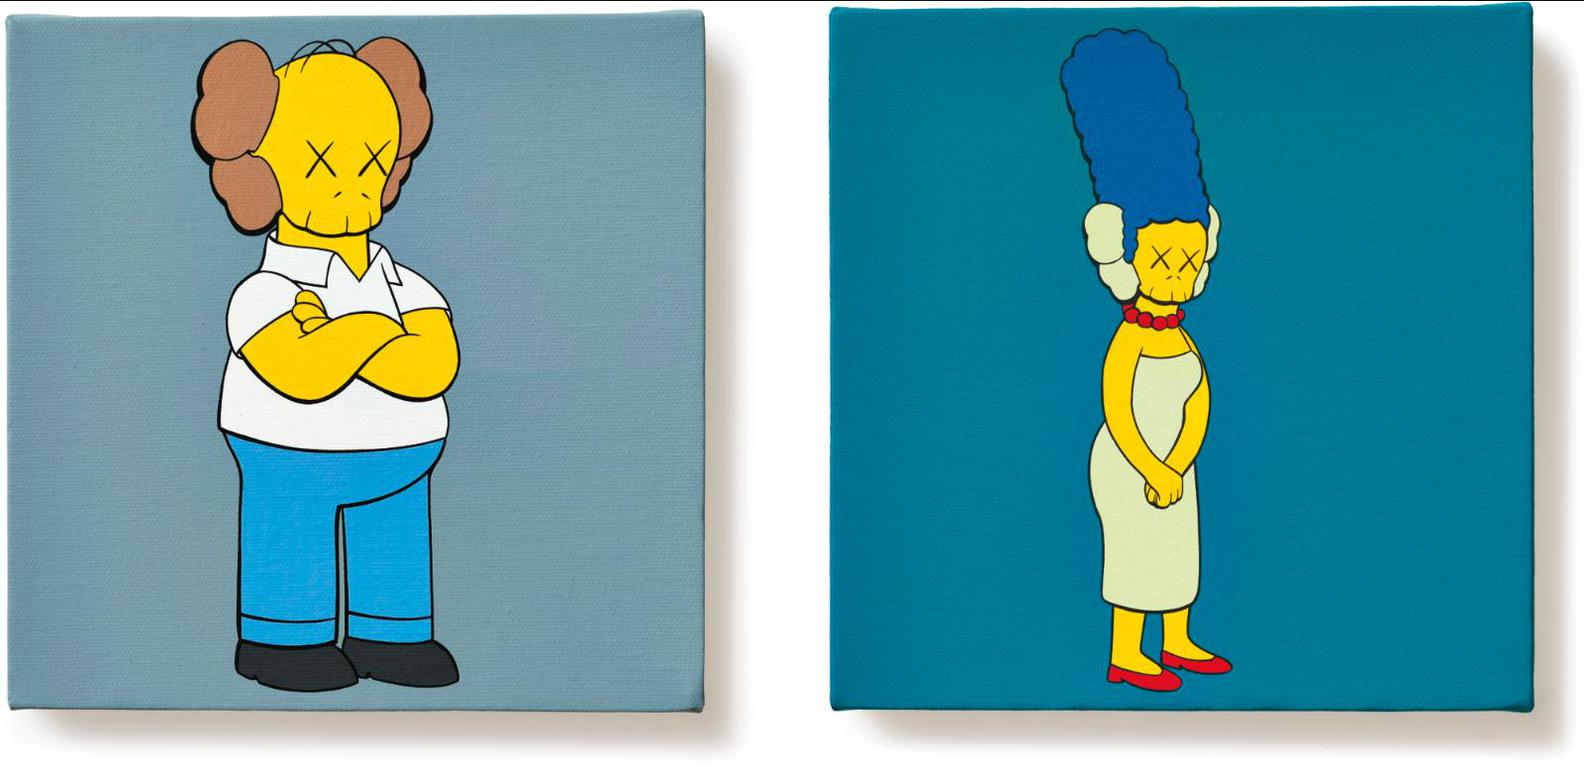 KAWS-Kimpsons Series (Two Works)-2005